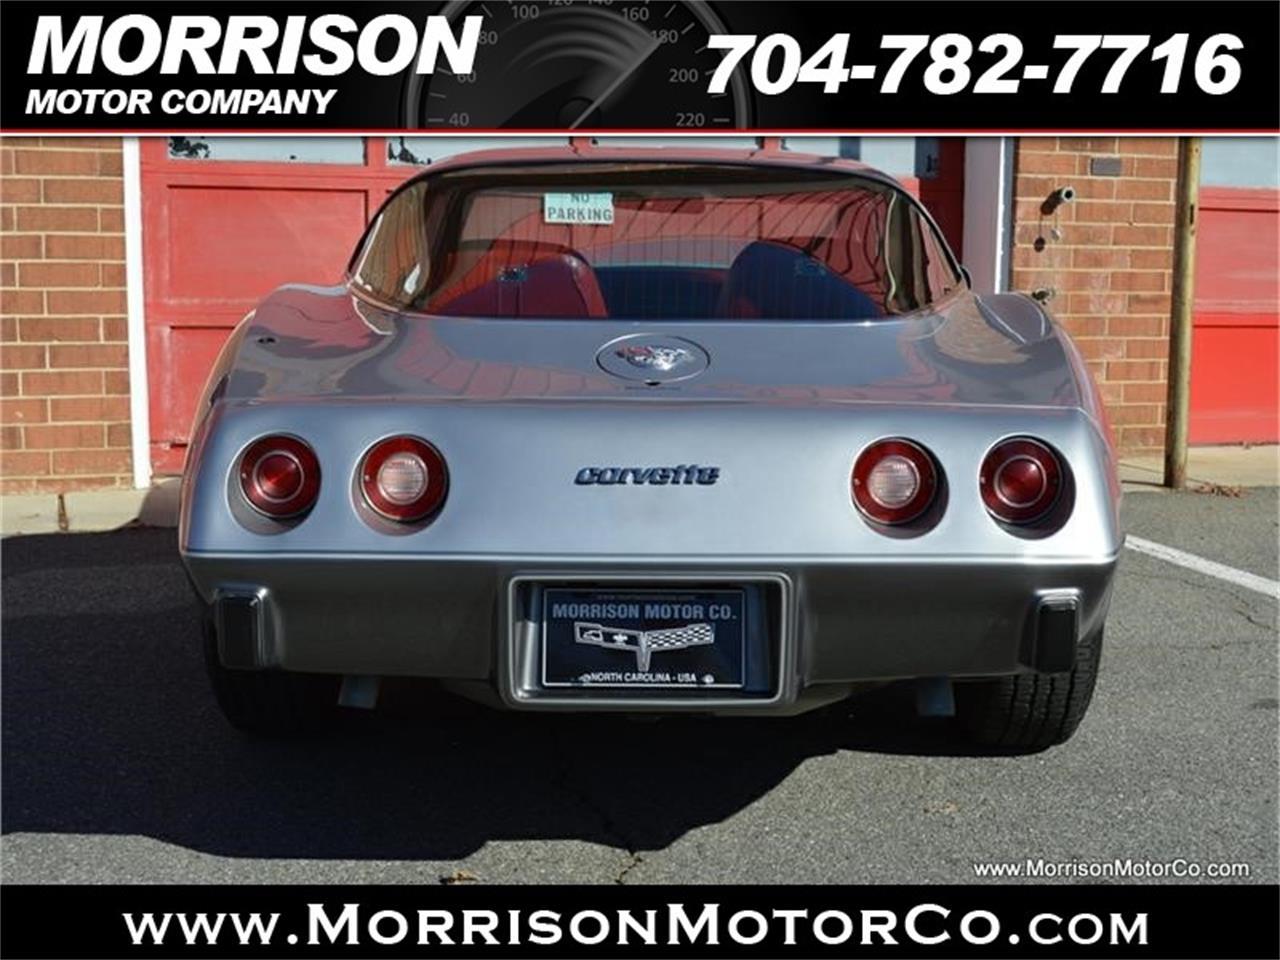 Honda Civic Concord Nc >> Morrison Motor Co Concord Nc - impremedia.net